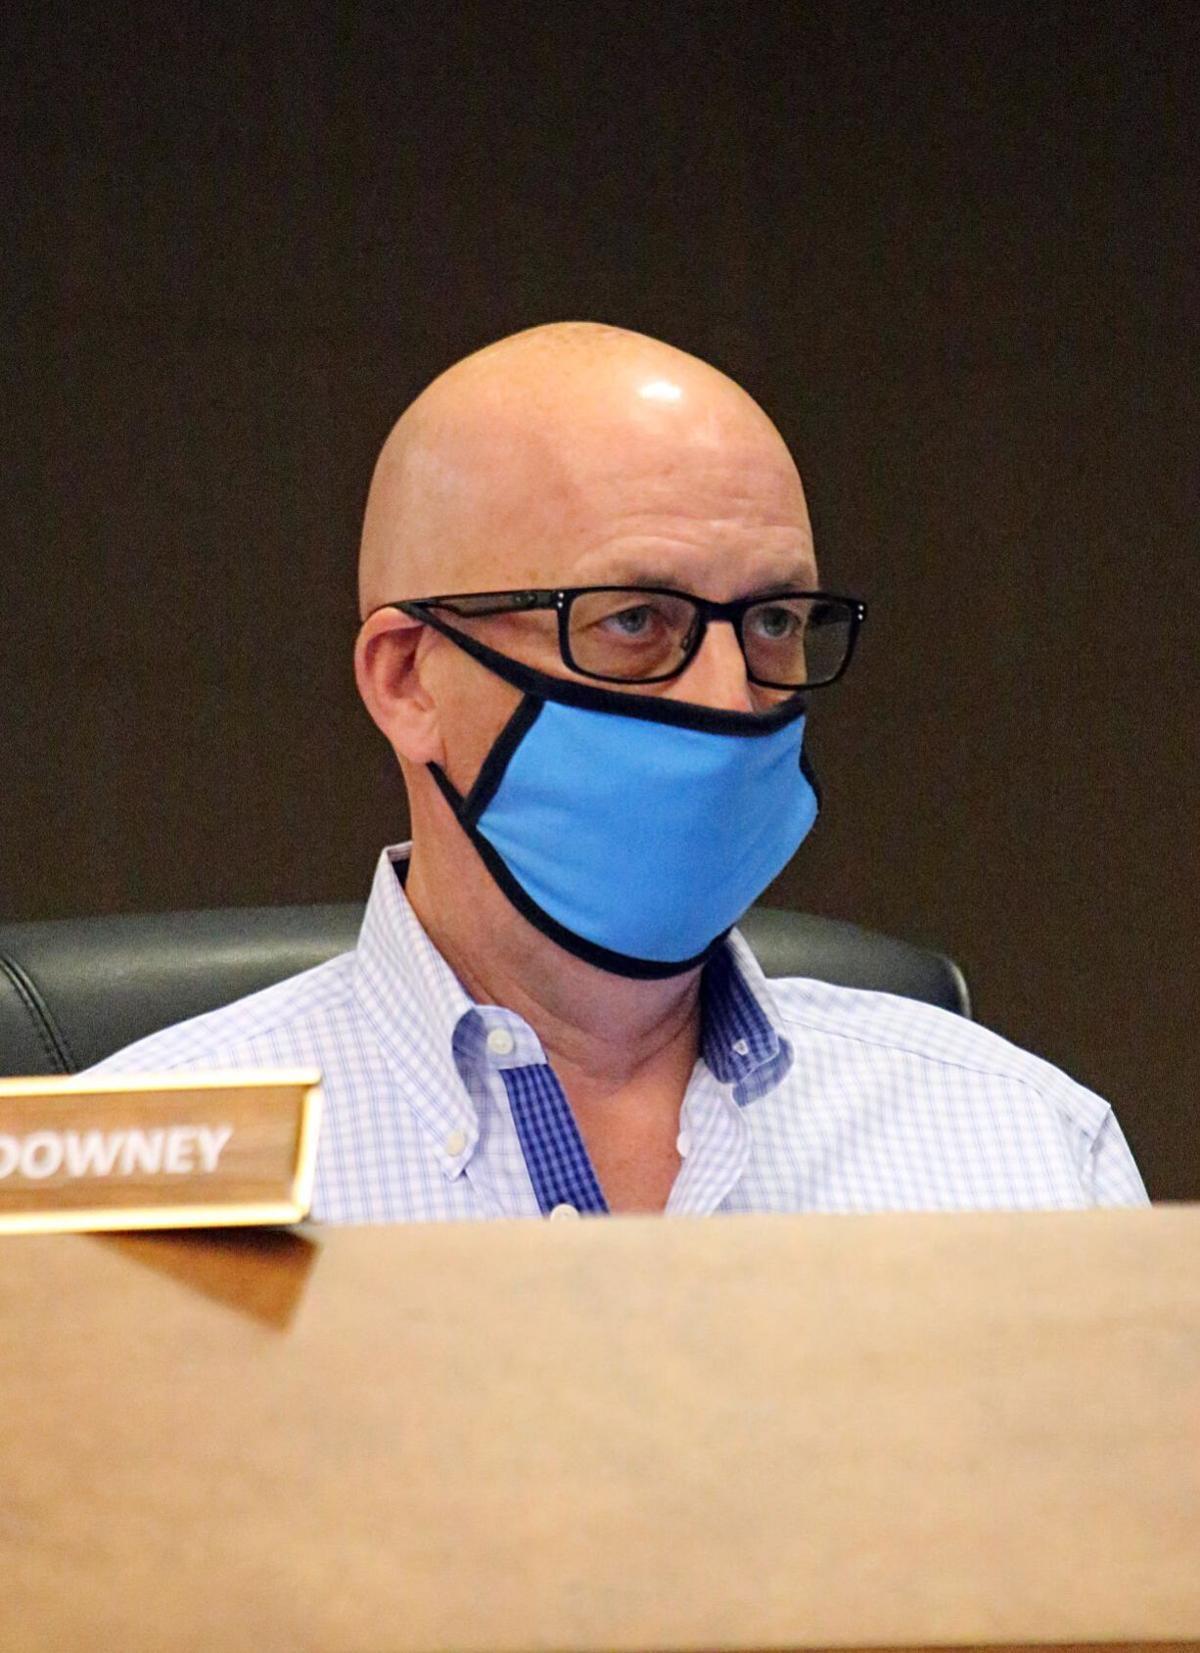 Downey.jpg